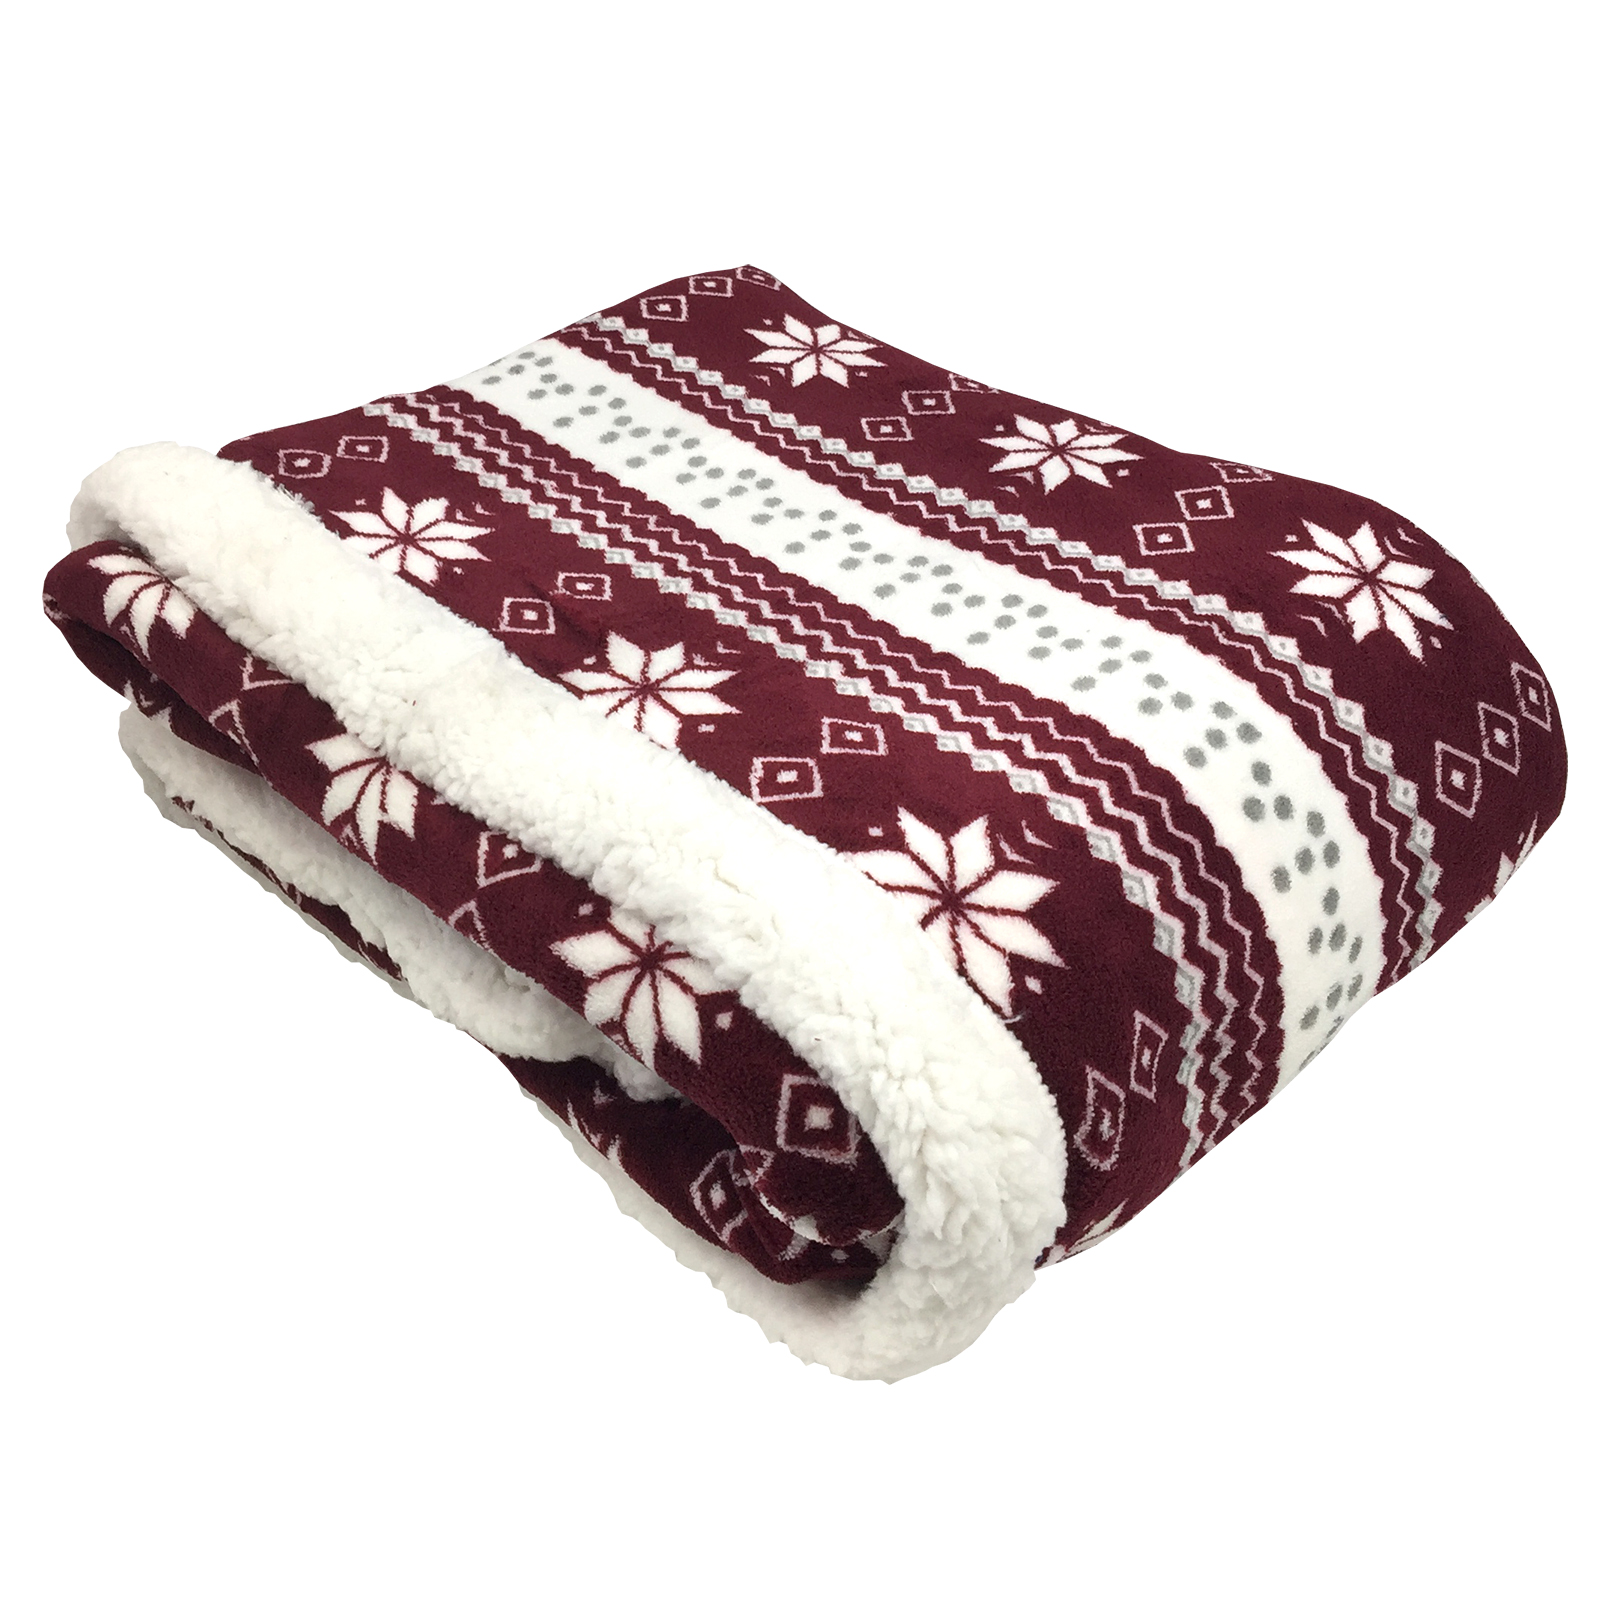 Super Soft Vintage Fleece Throw Single Size 130x160 cm Sofa